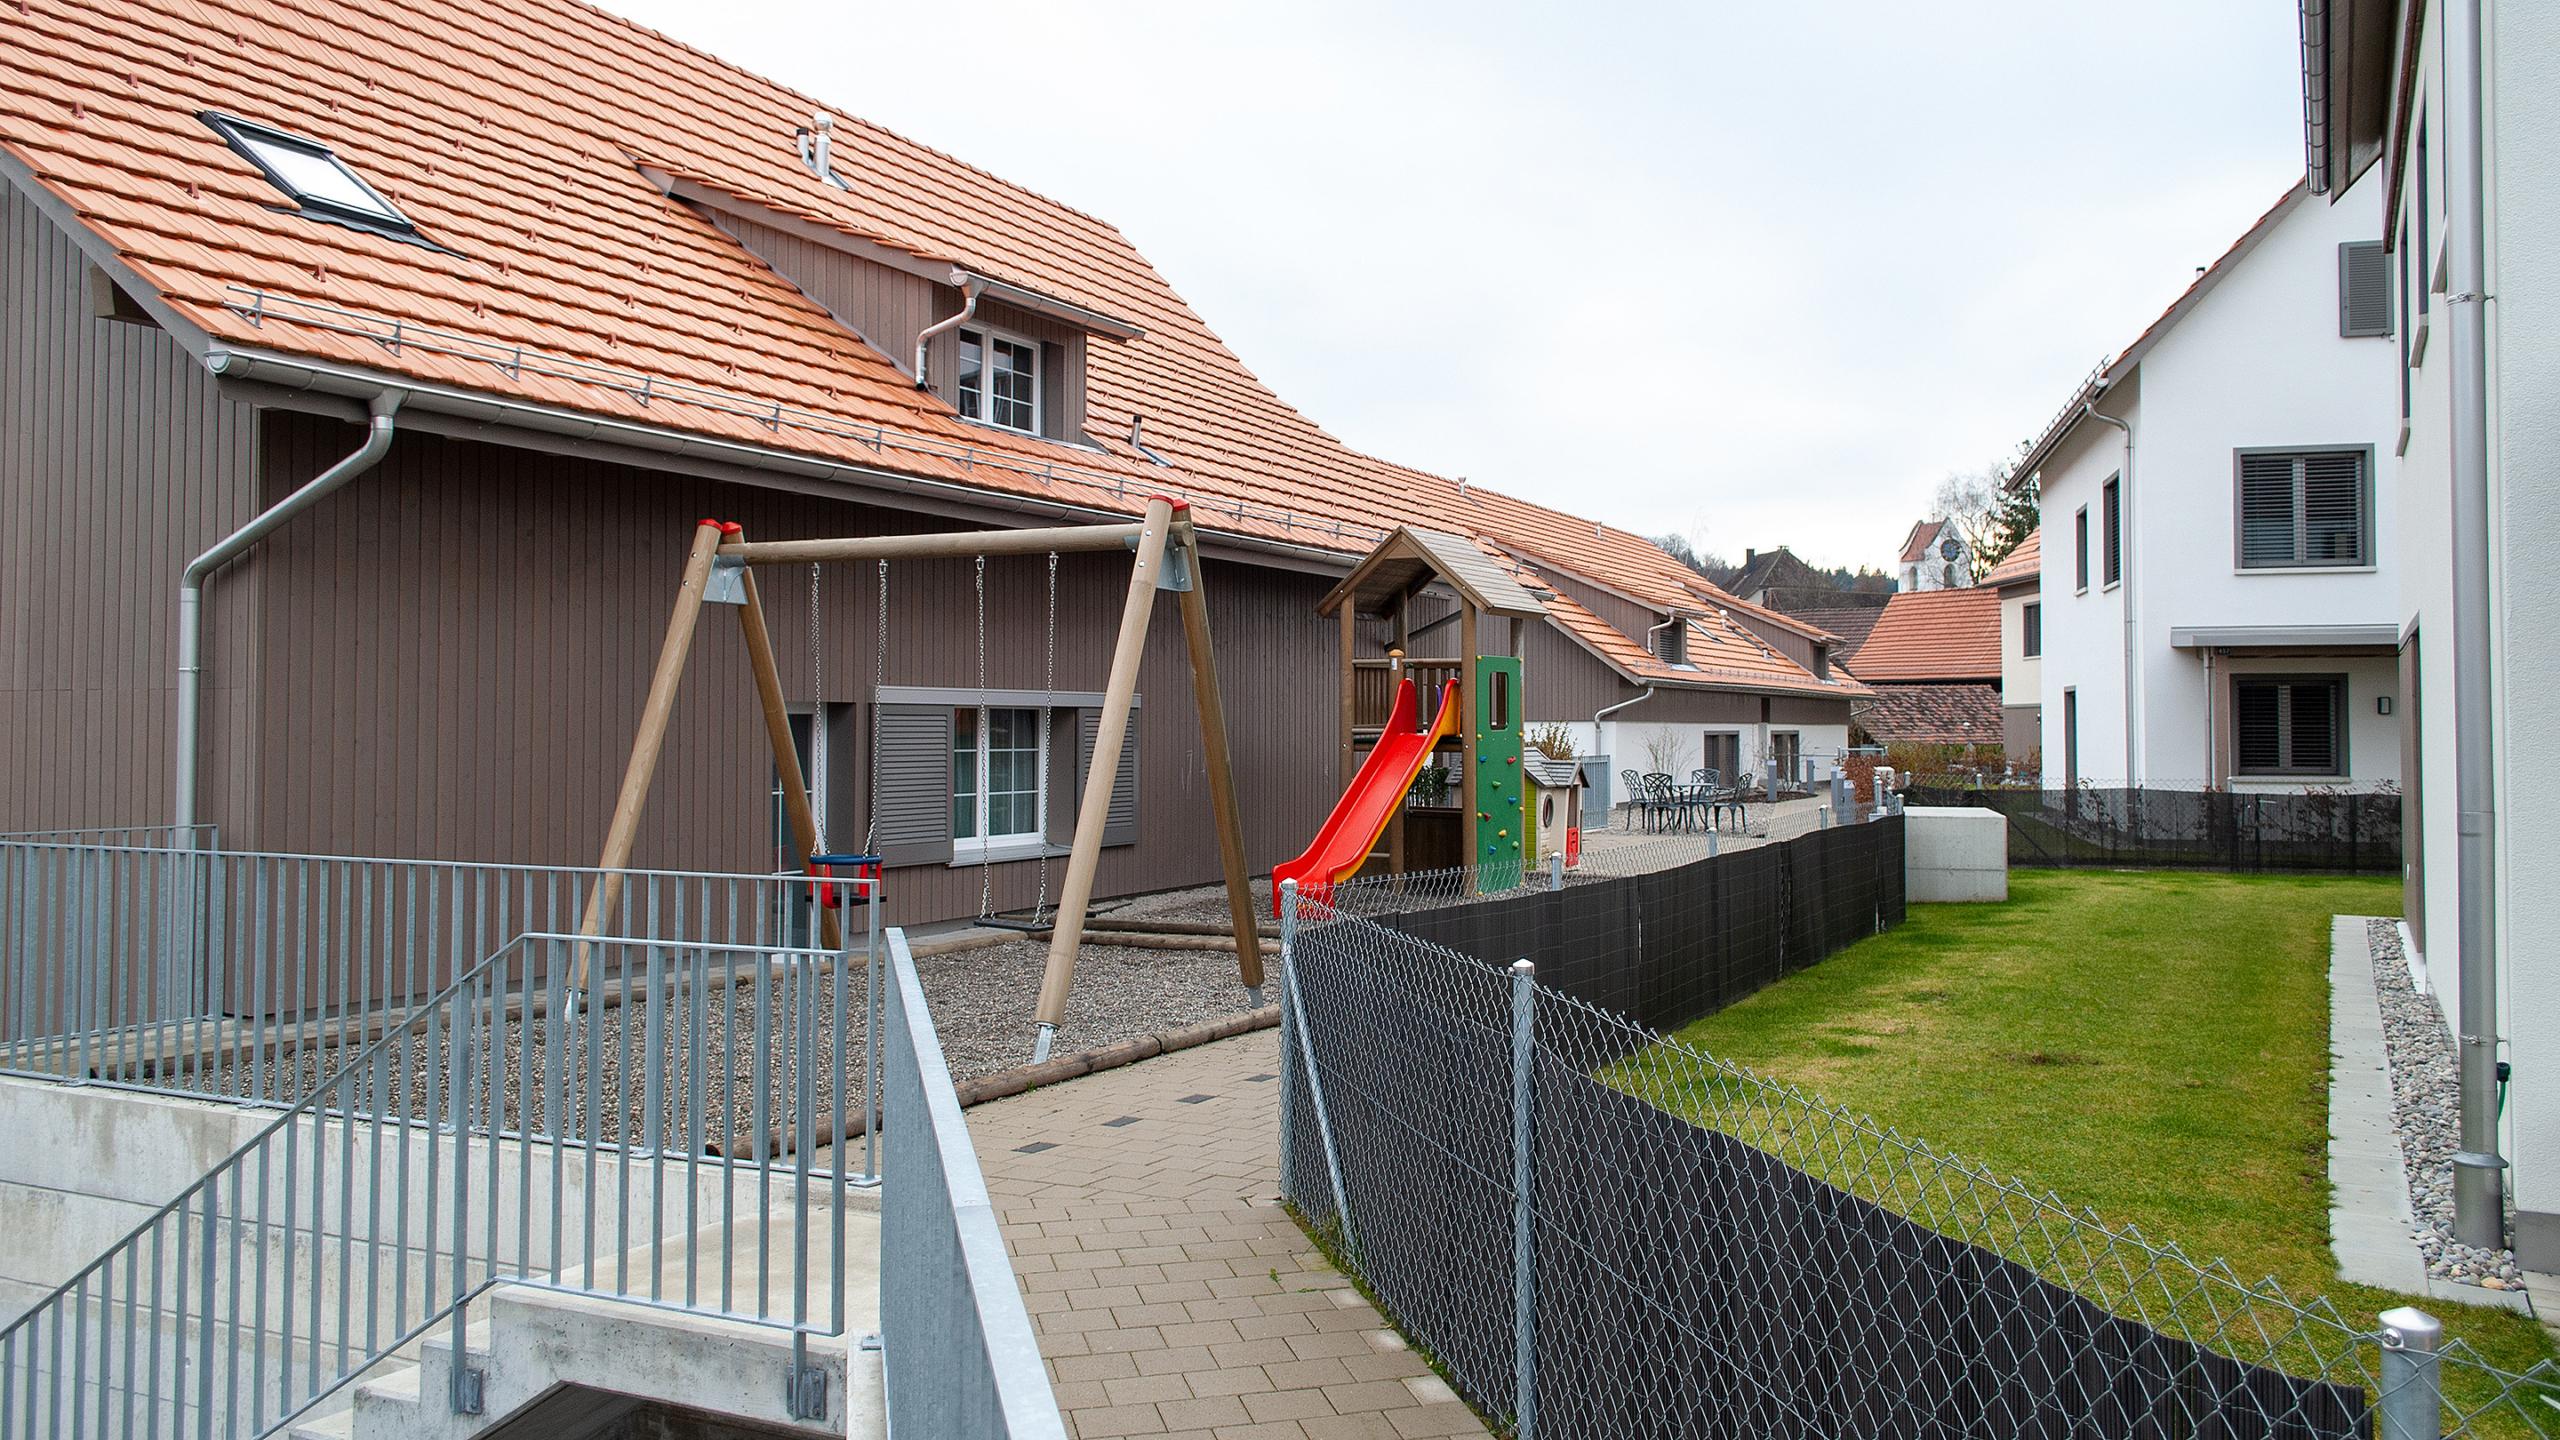 Projekt Schauenbergblick in Schlatt